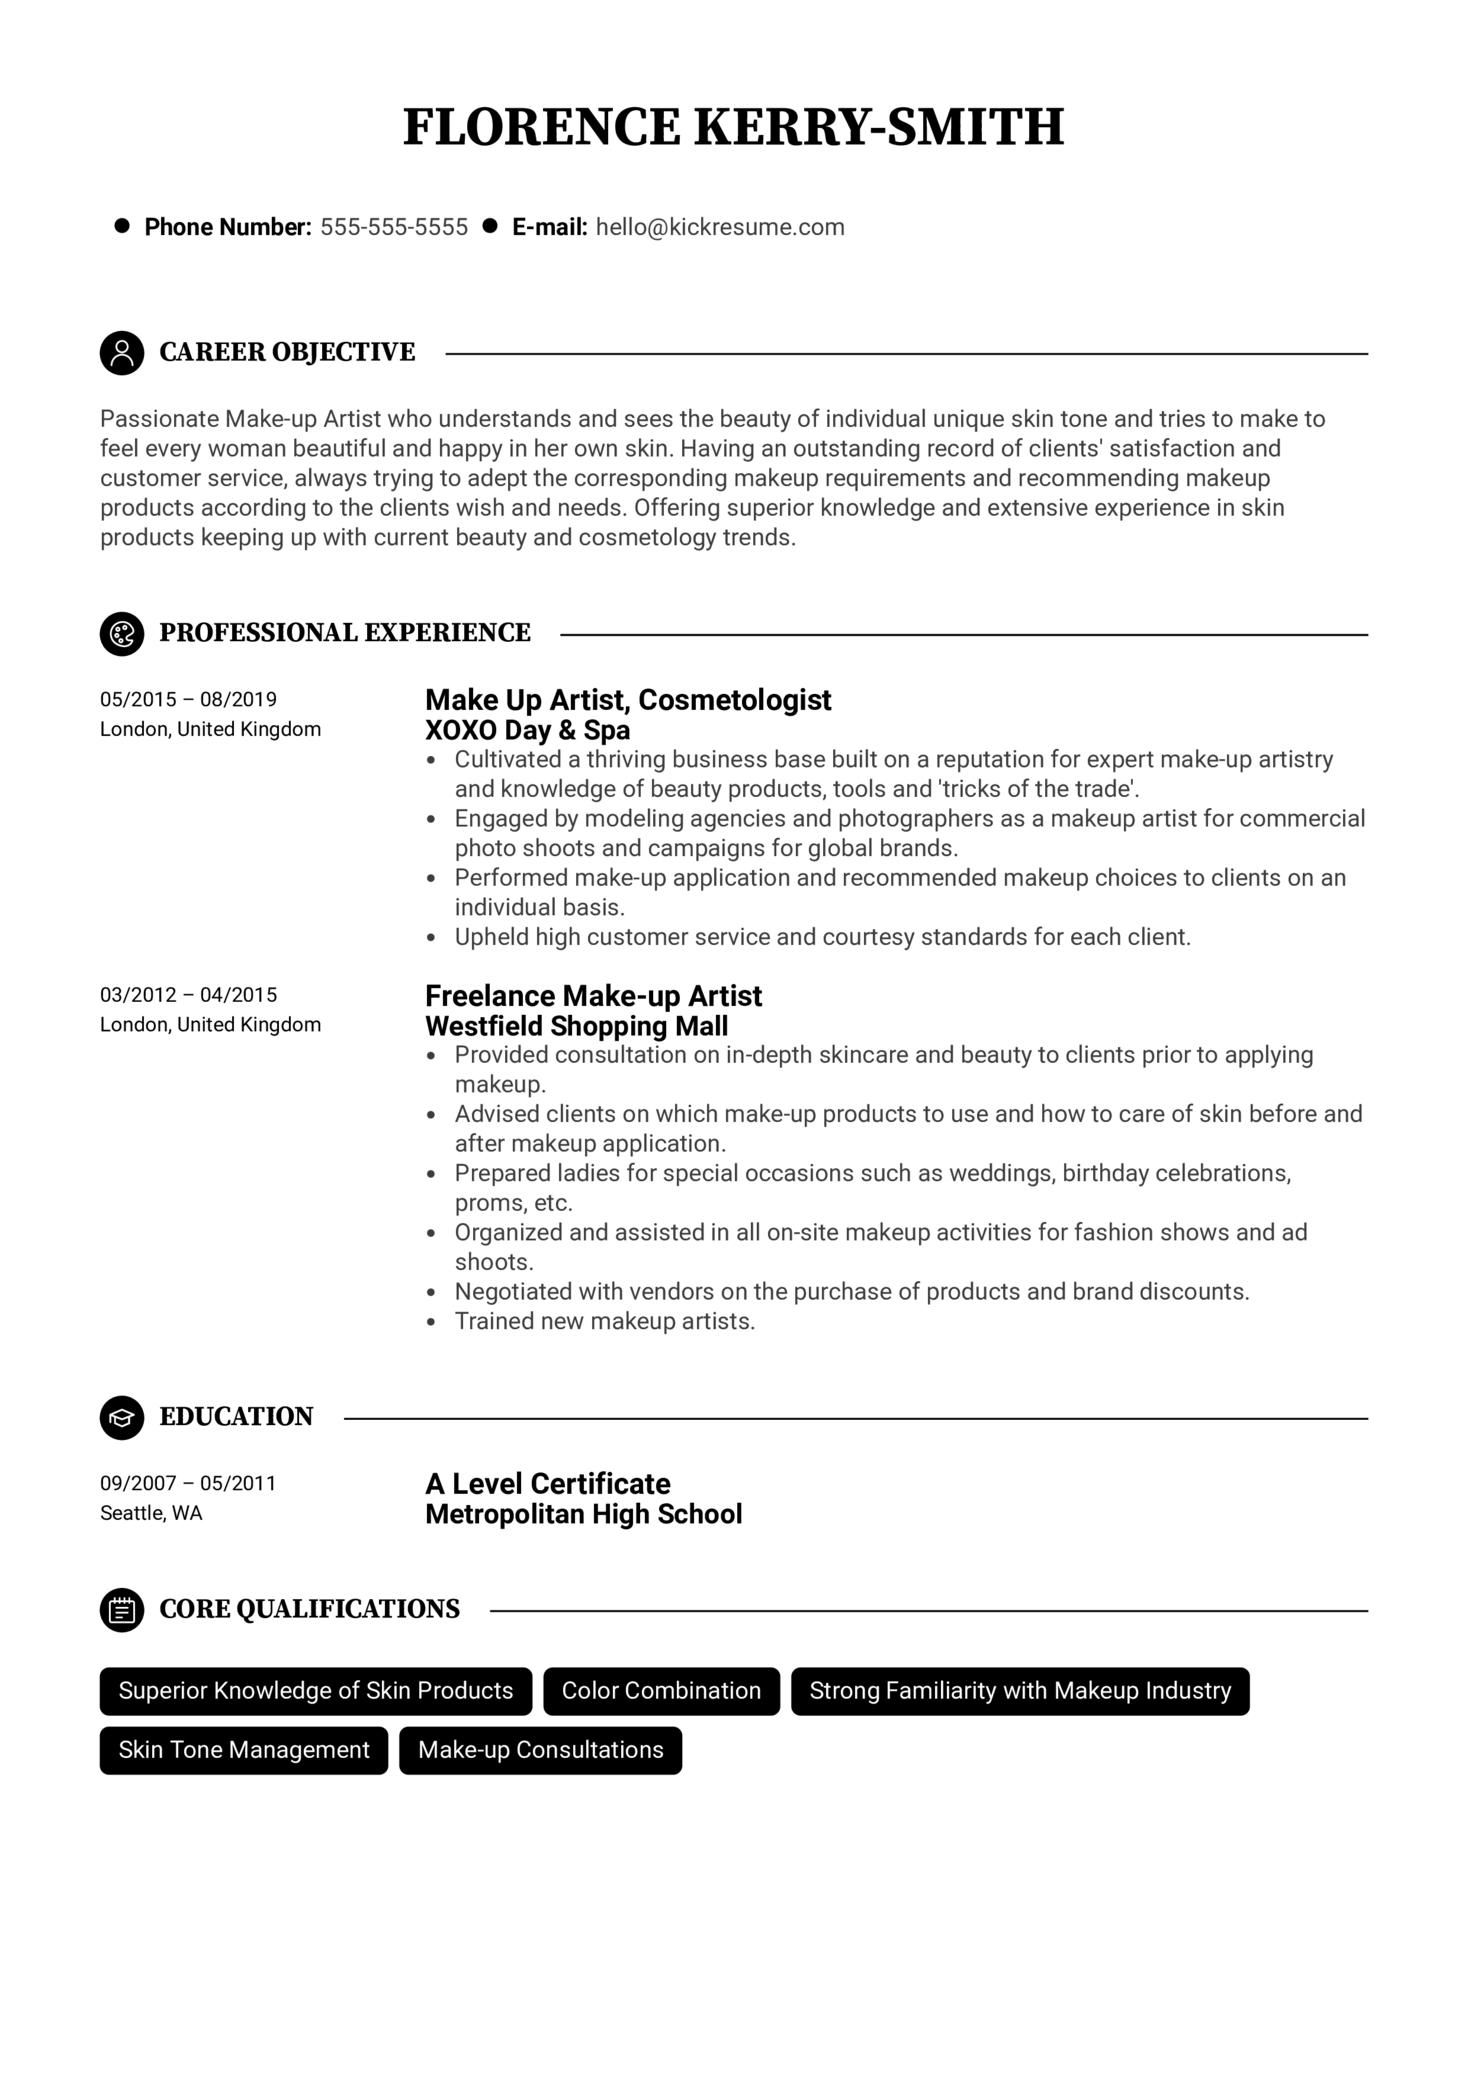 Make-up Artist Resume Example (parte 1)